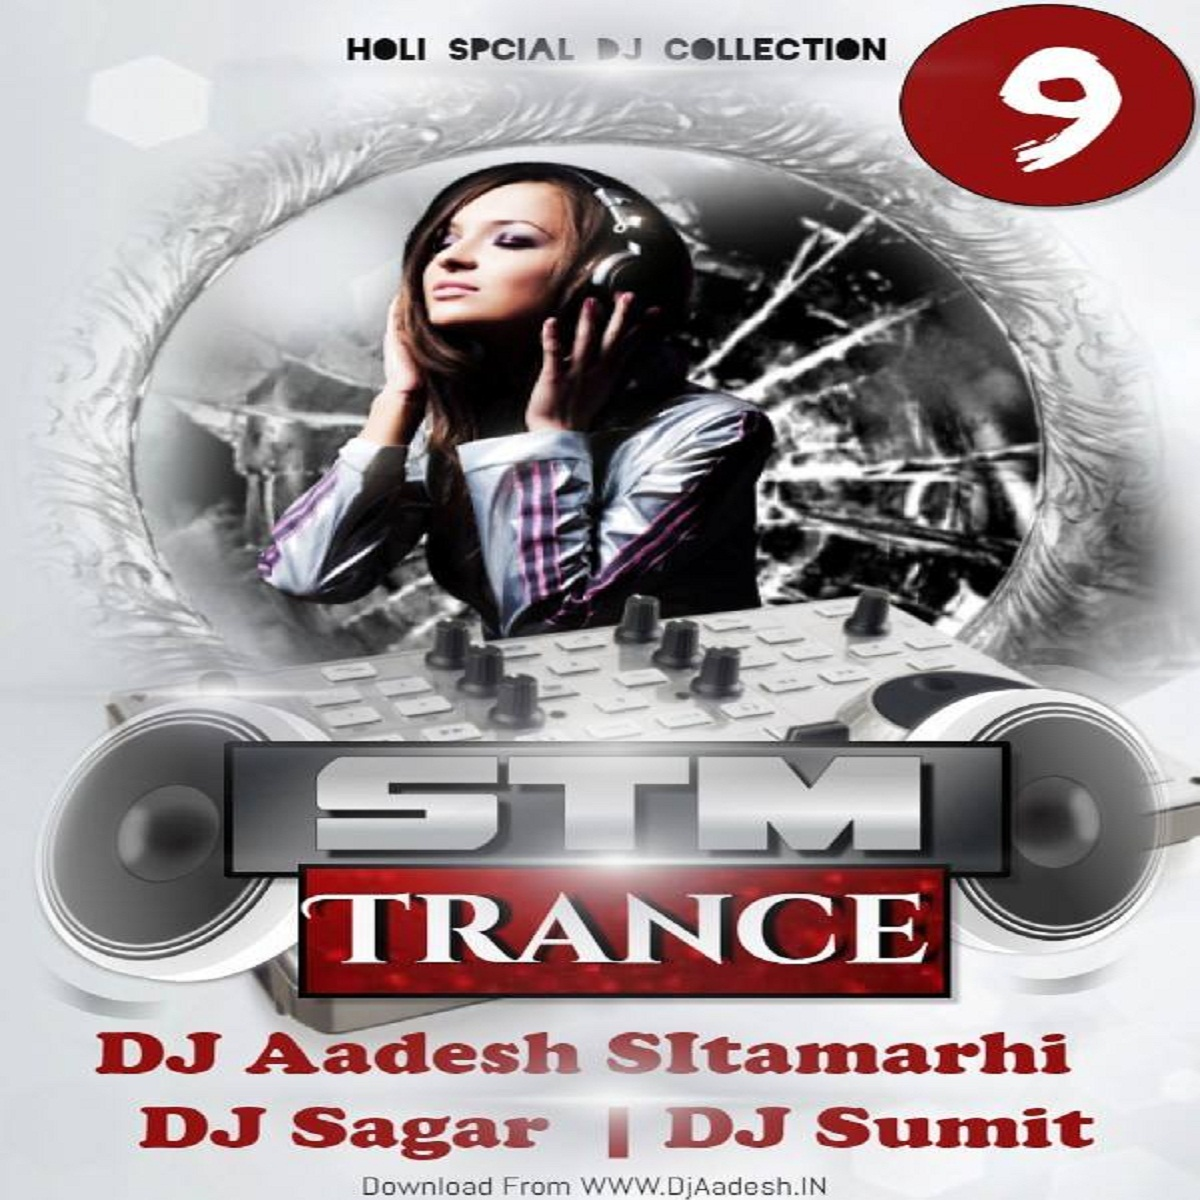 Dirty Dutch Vol-19 DJ Mj Production